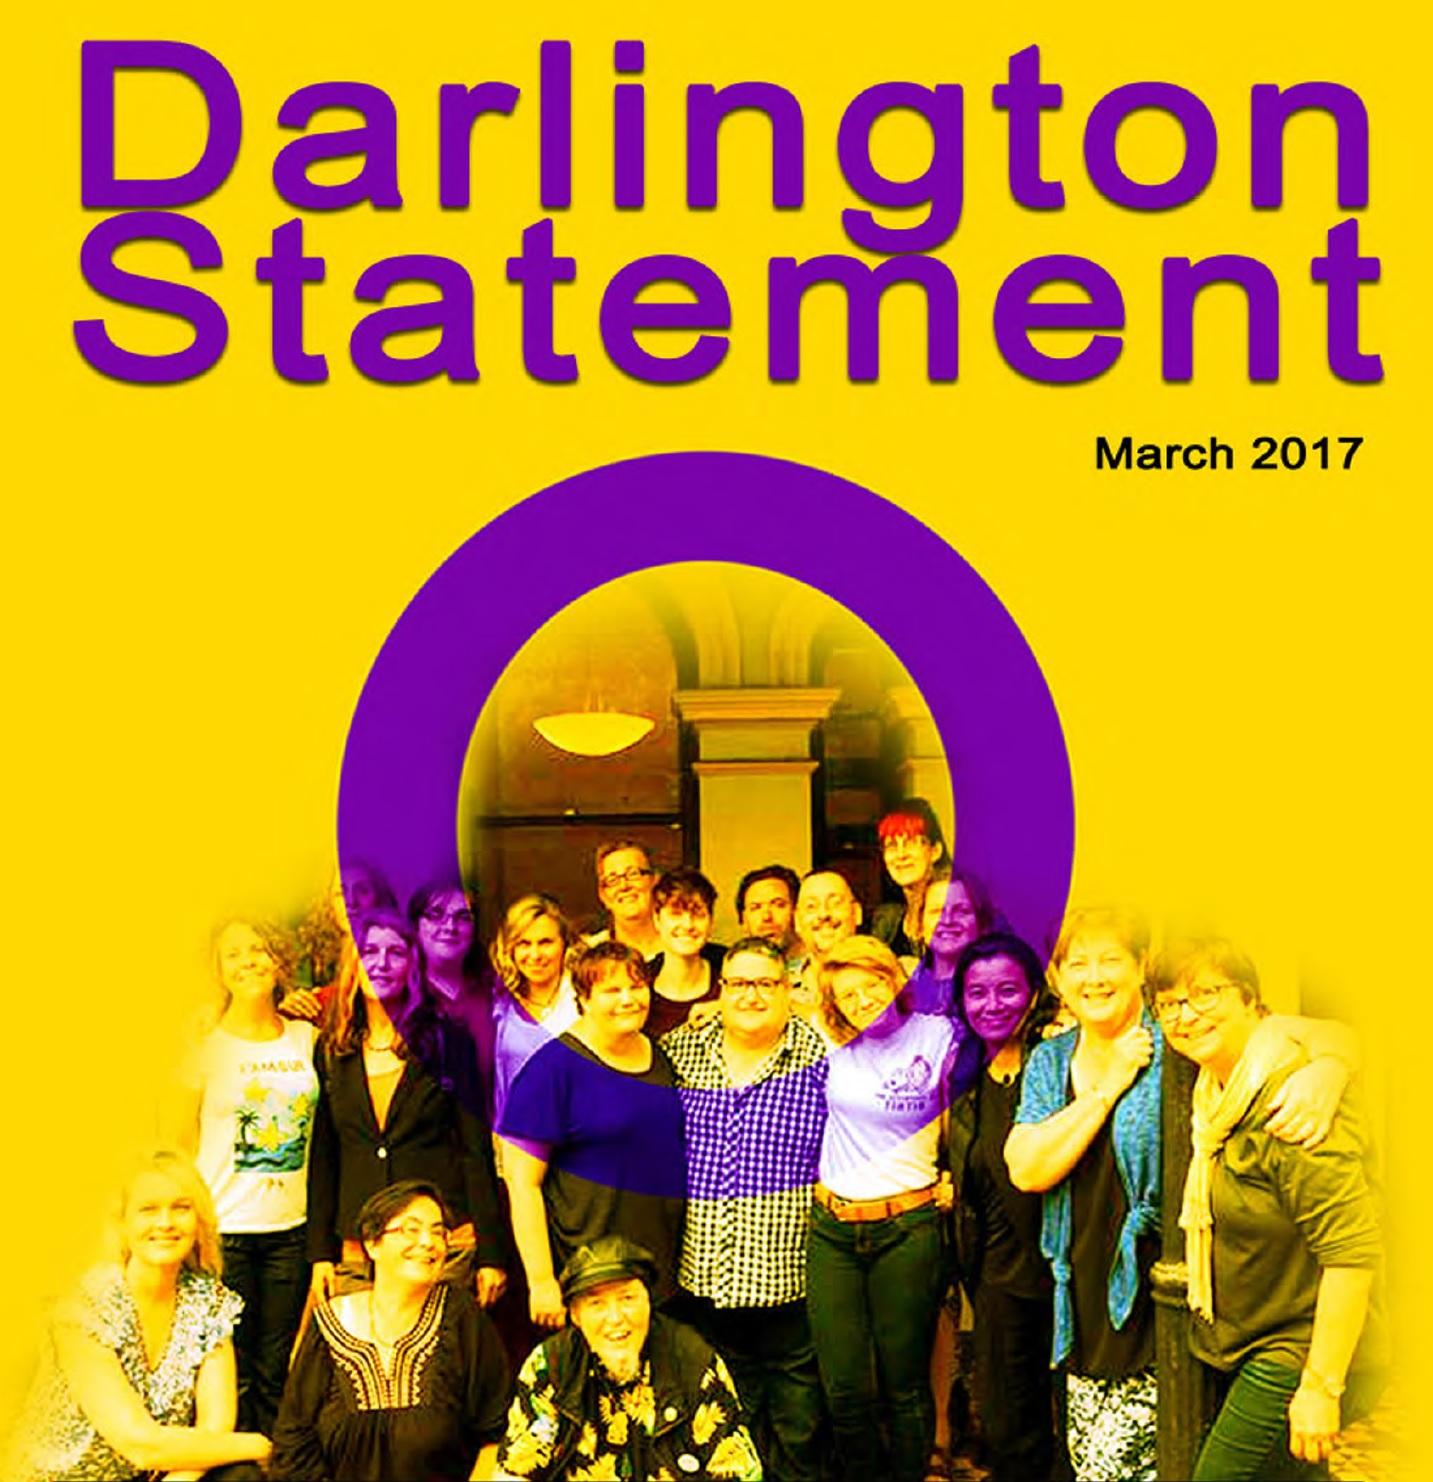 Darlington Statement